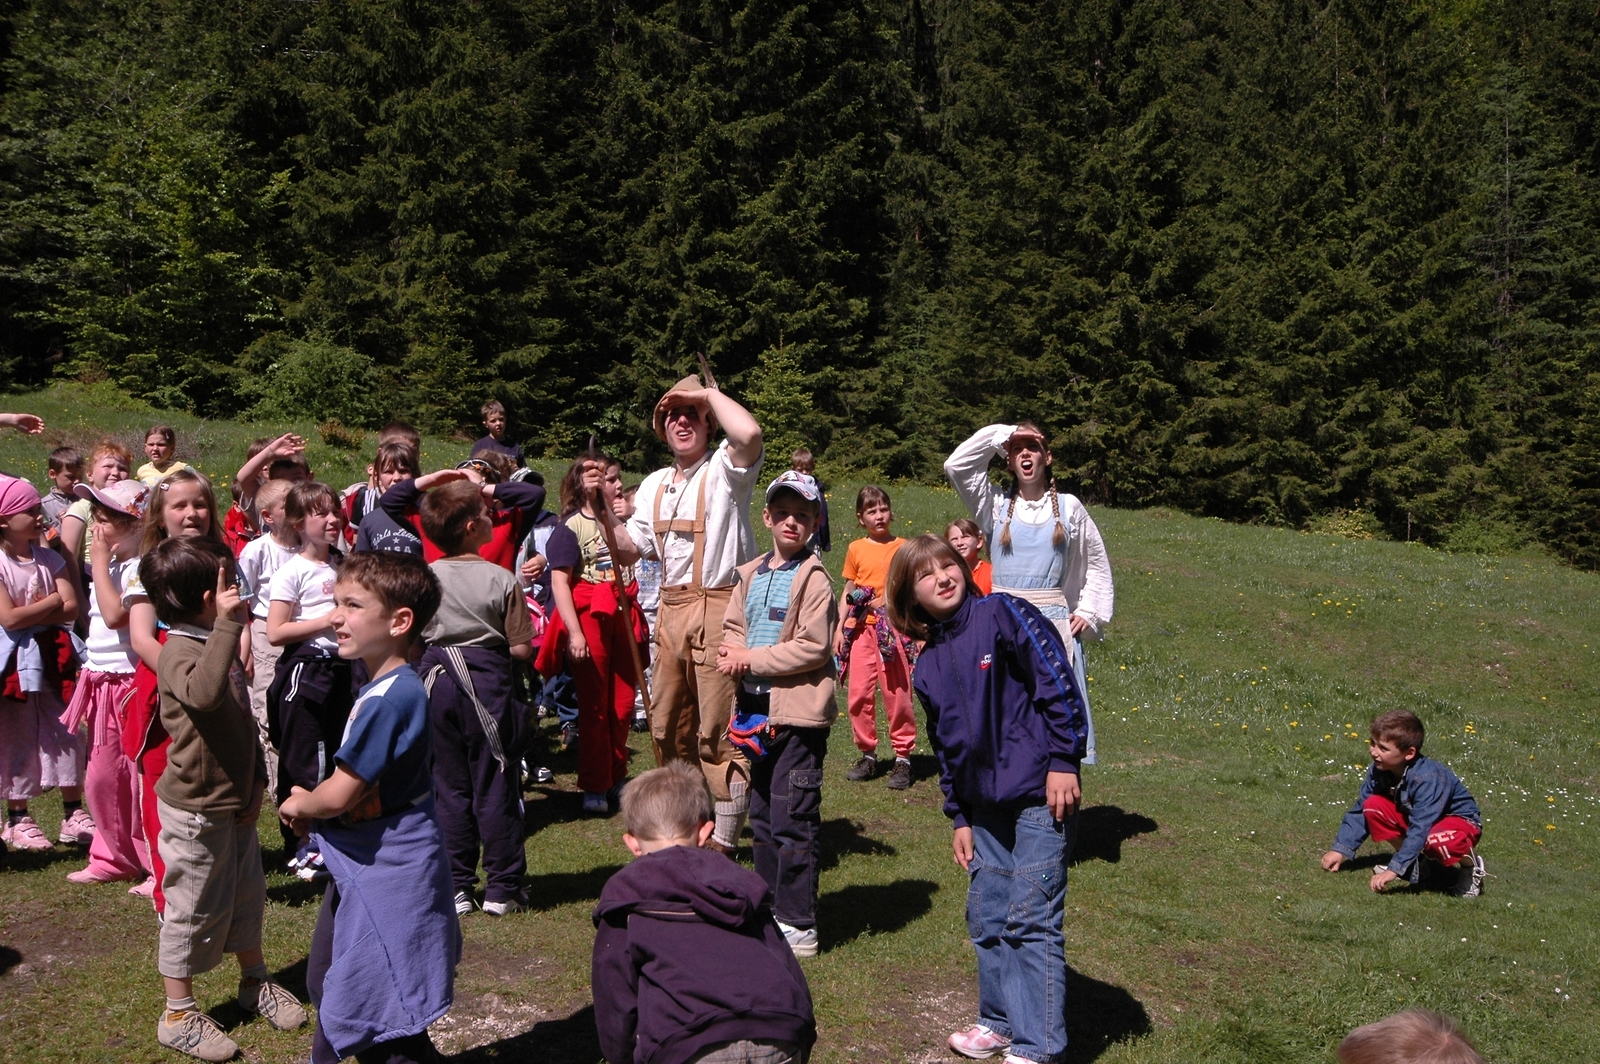 Kekec; foto: Kranjska Gora Tourist Board, photo: Klemen Gričar; vir: www.slovenia.info